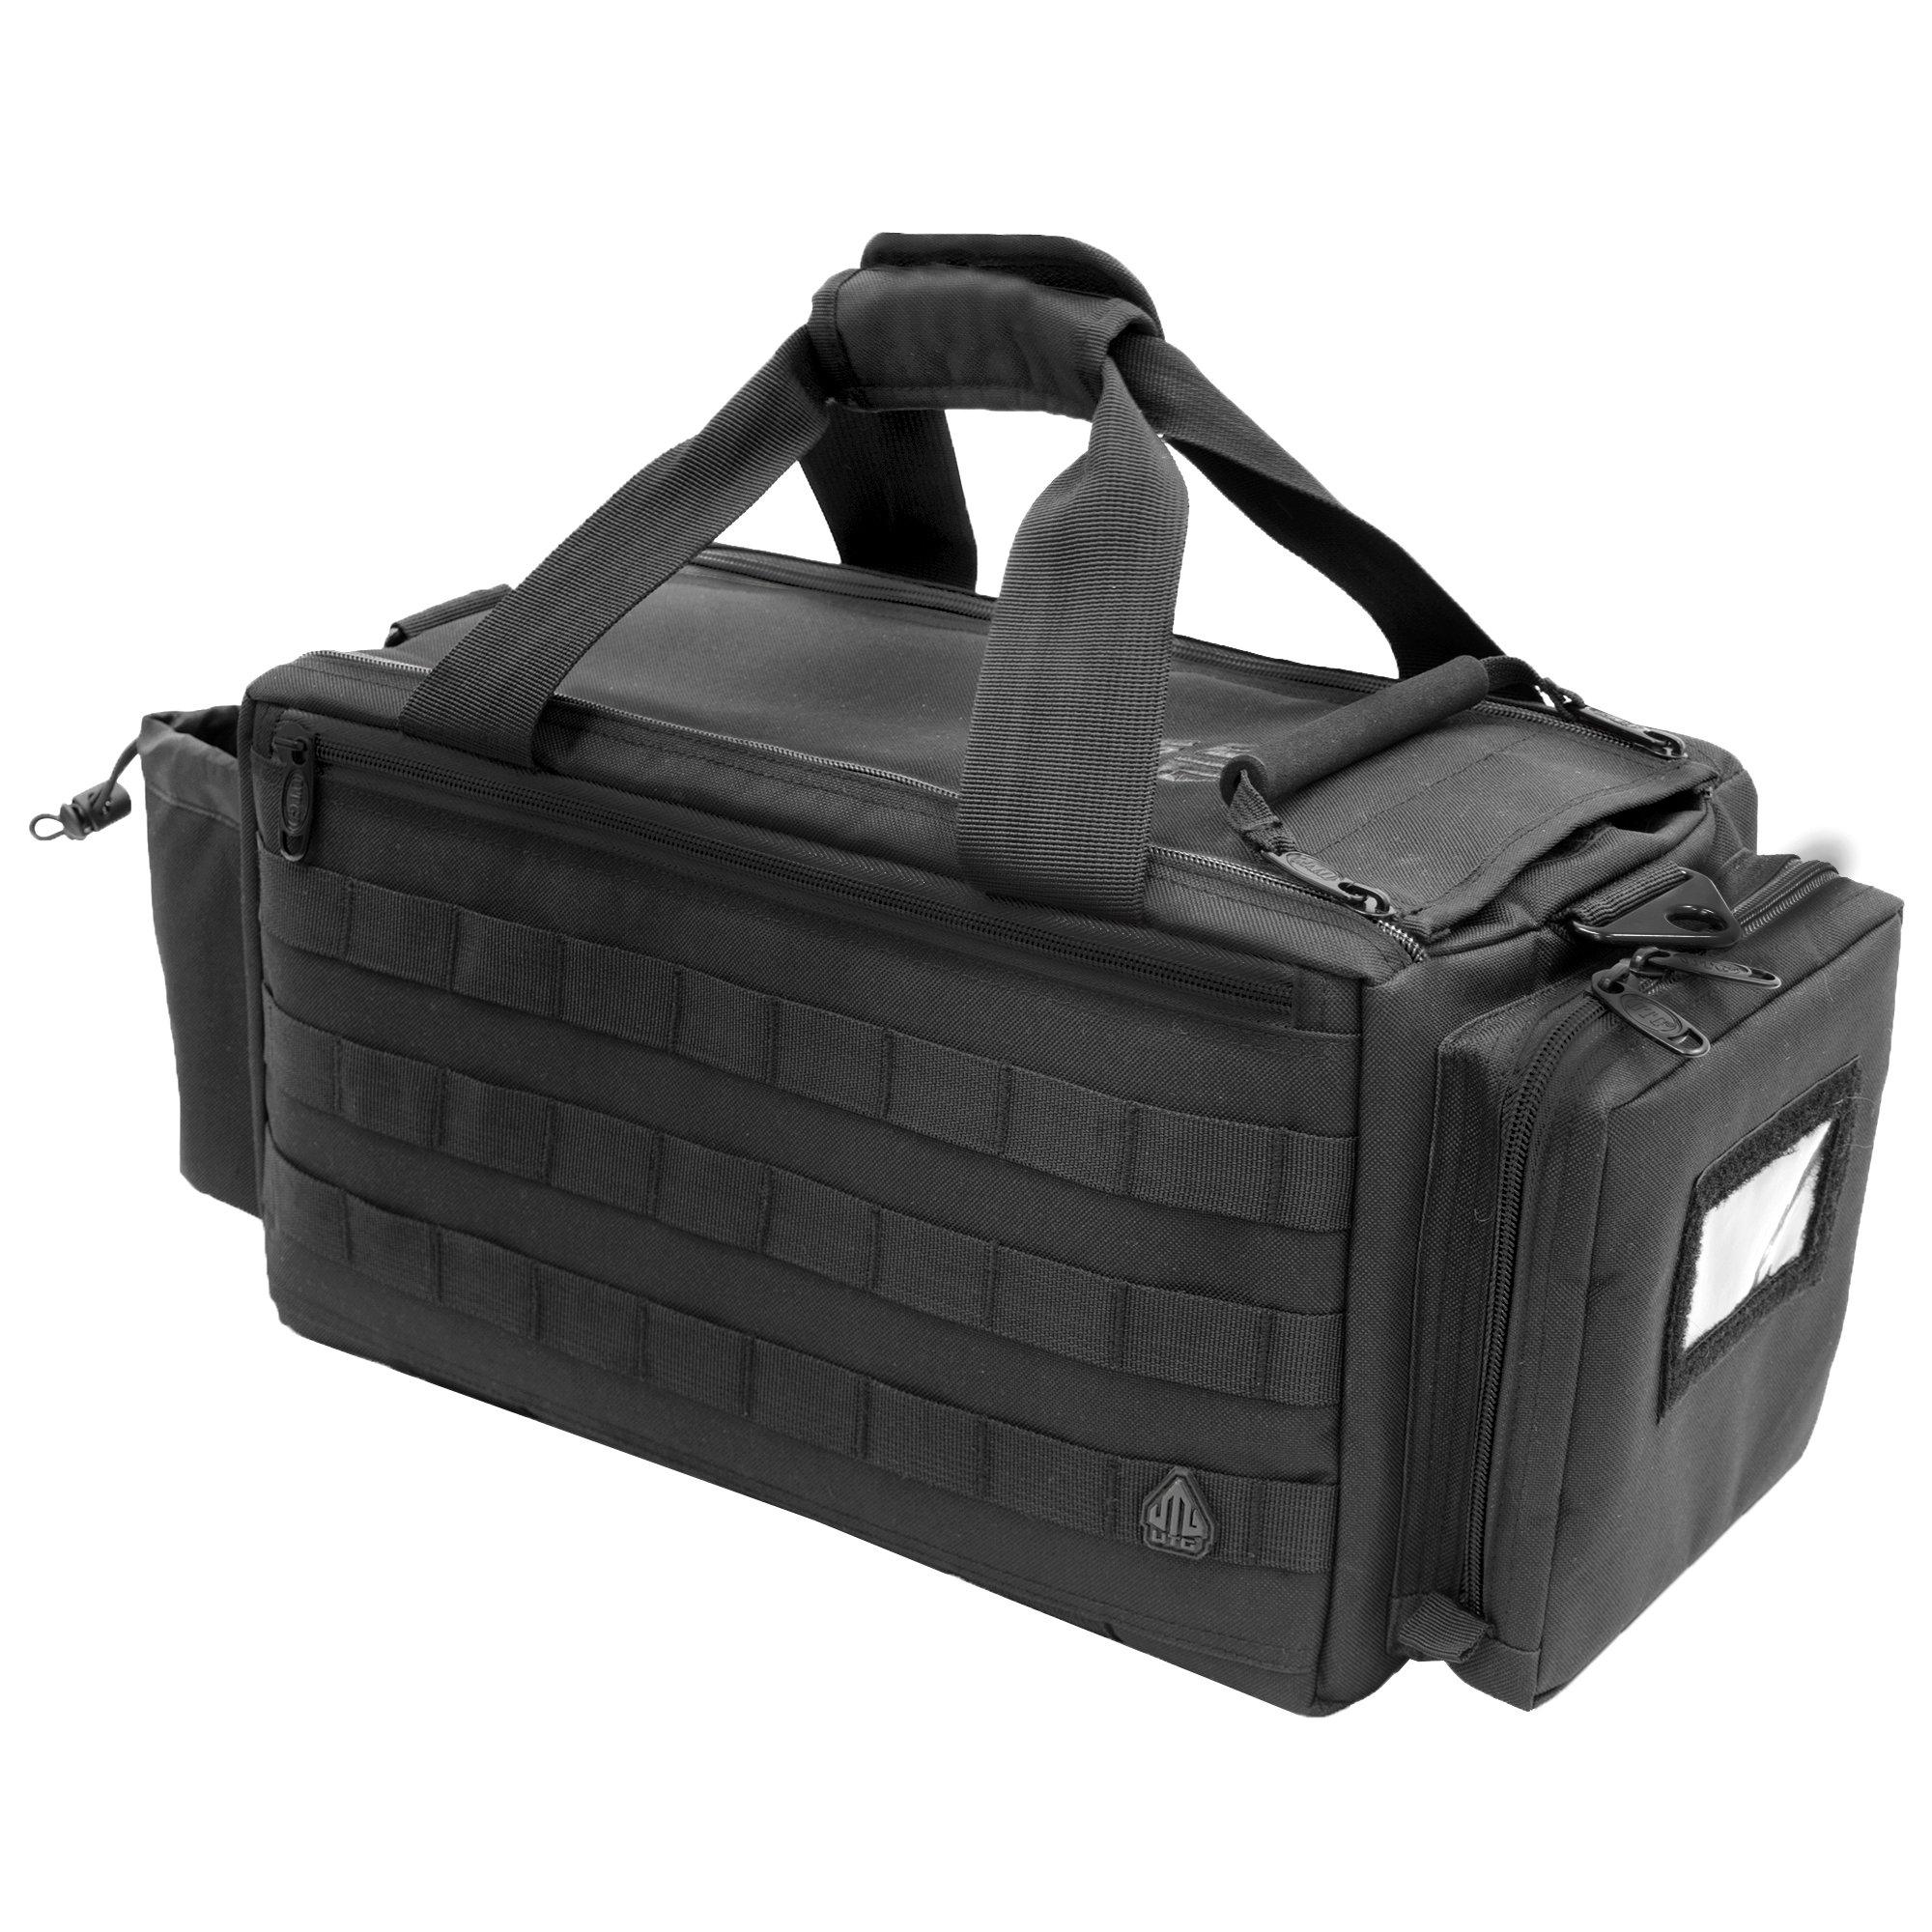 UTG All in One Range/Utility Go Bag, Black, 21'' x 10'' x 9'' by UTG (Image #2)